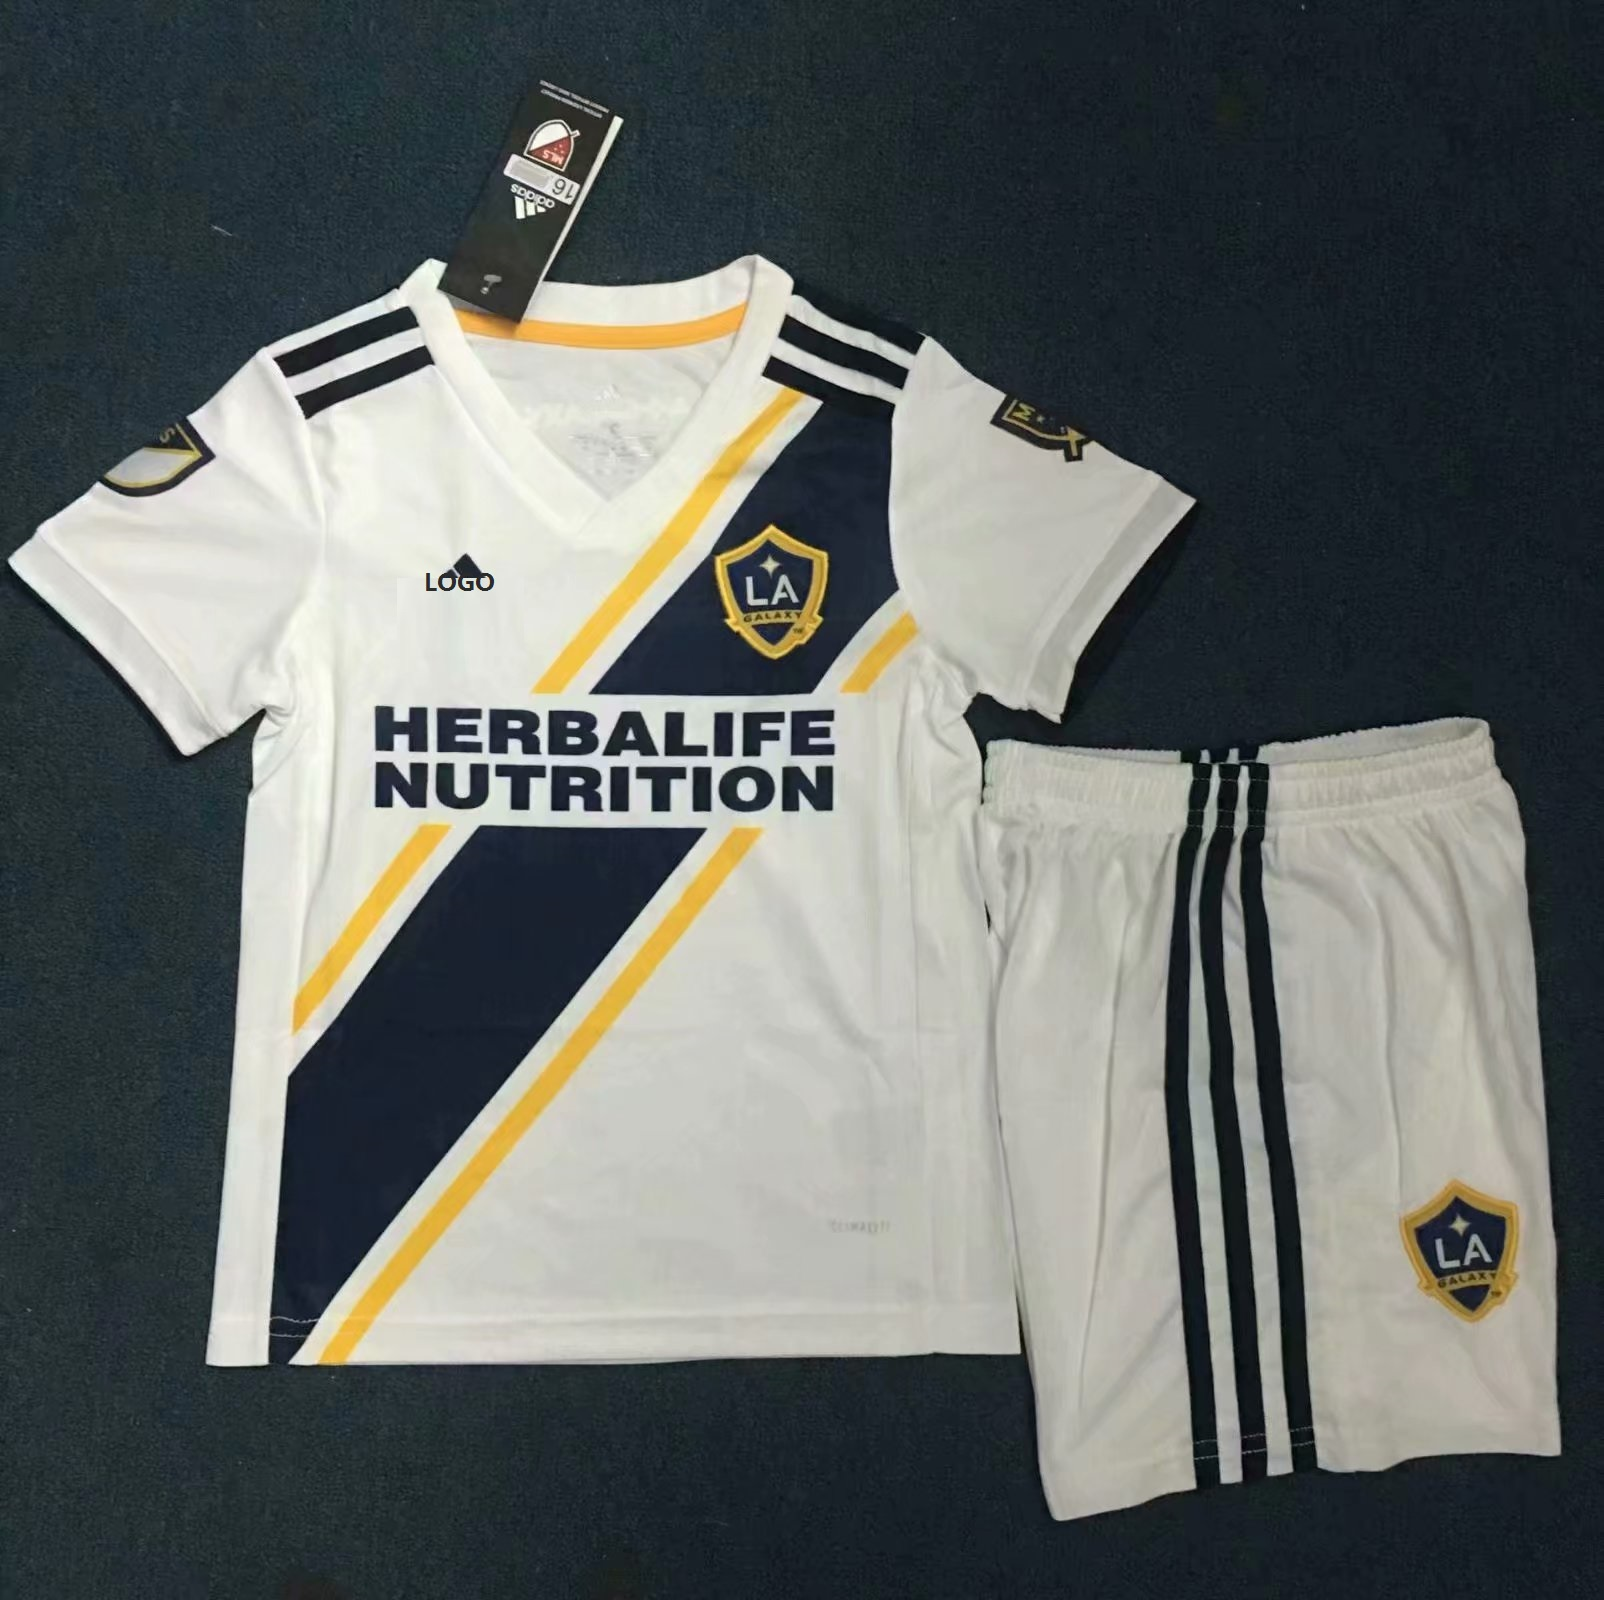 1b5b5244a 2019-20 Kids LA GALAXY Home Jersey Kits Soccer Uniforms